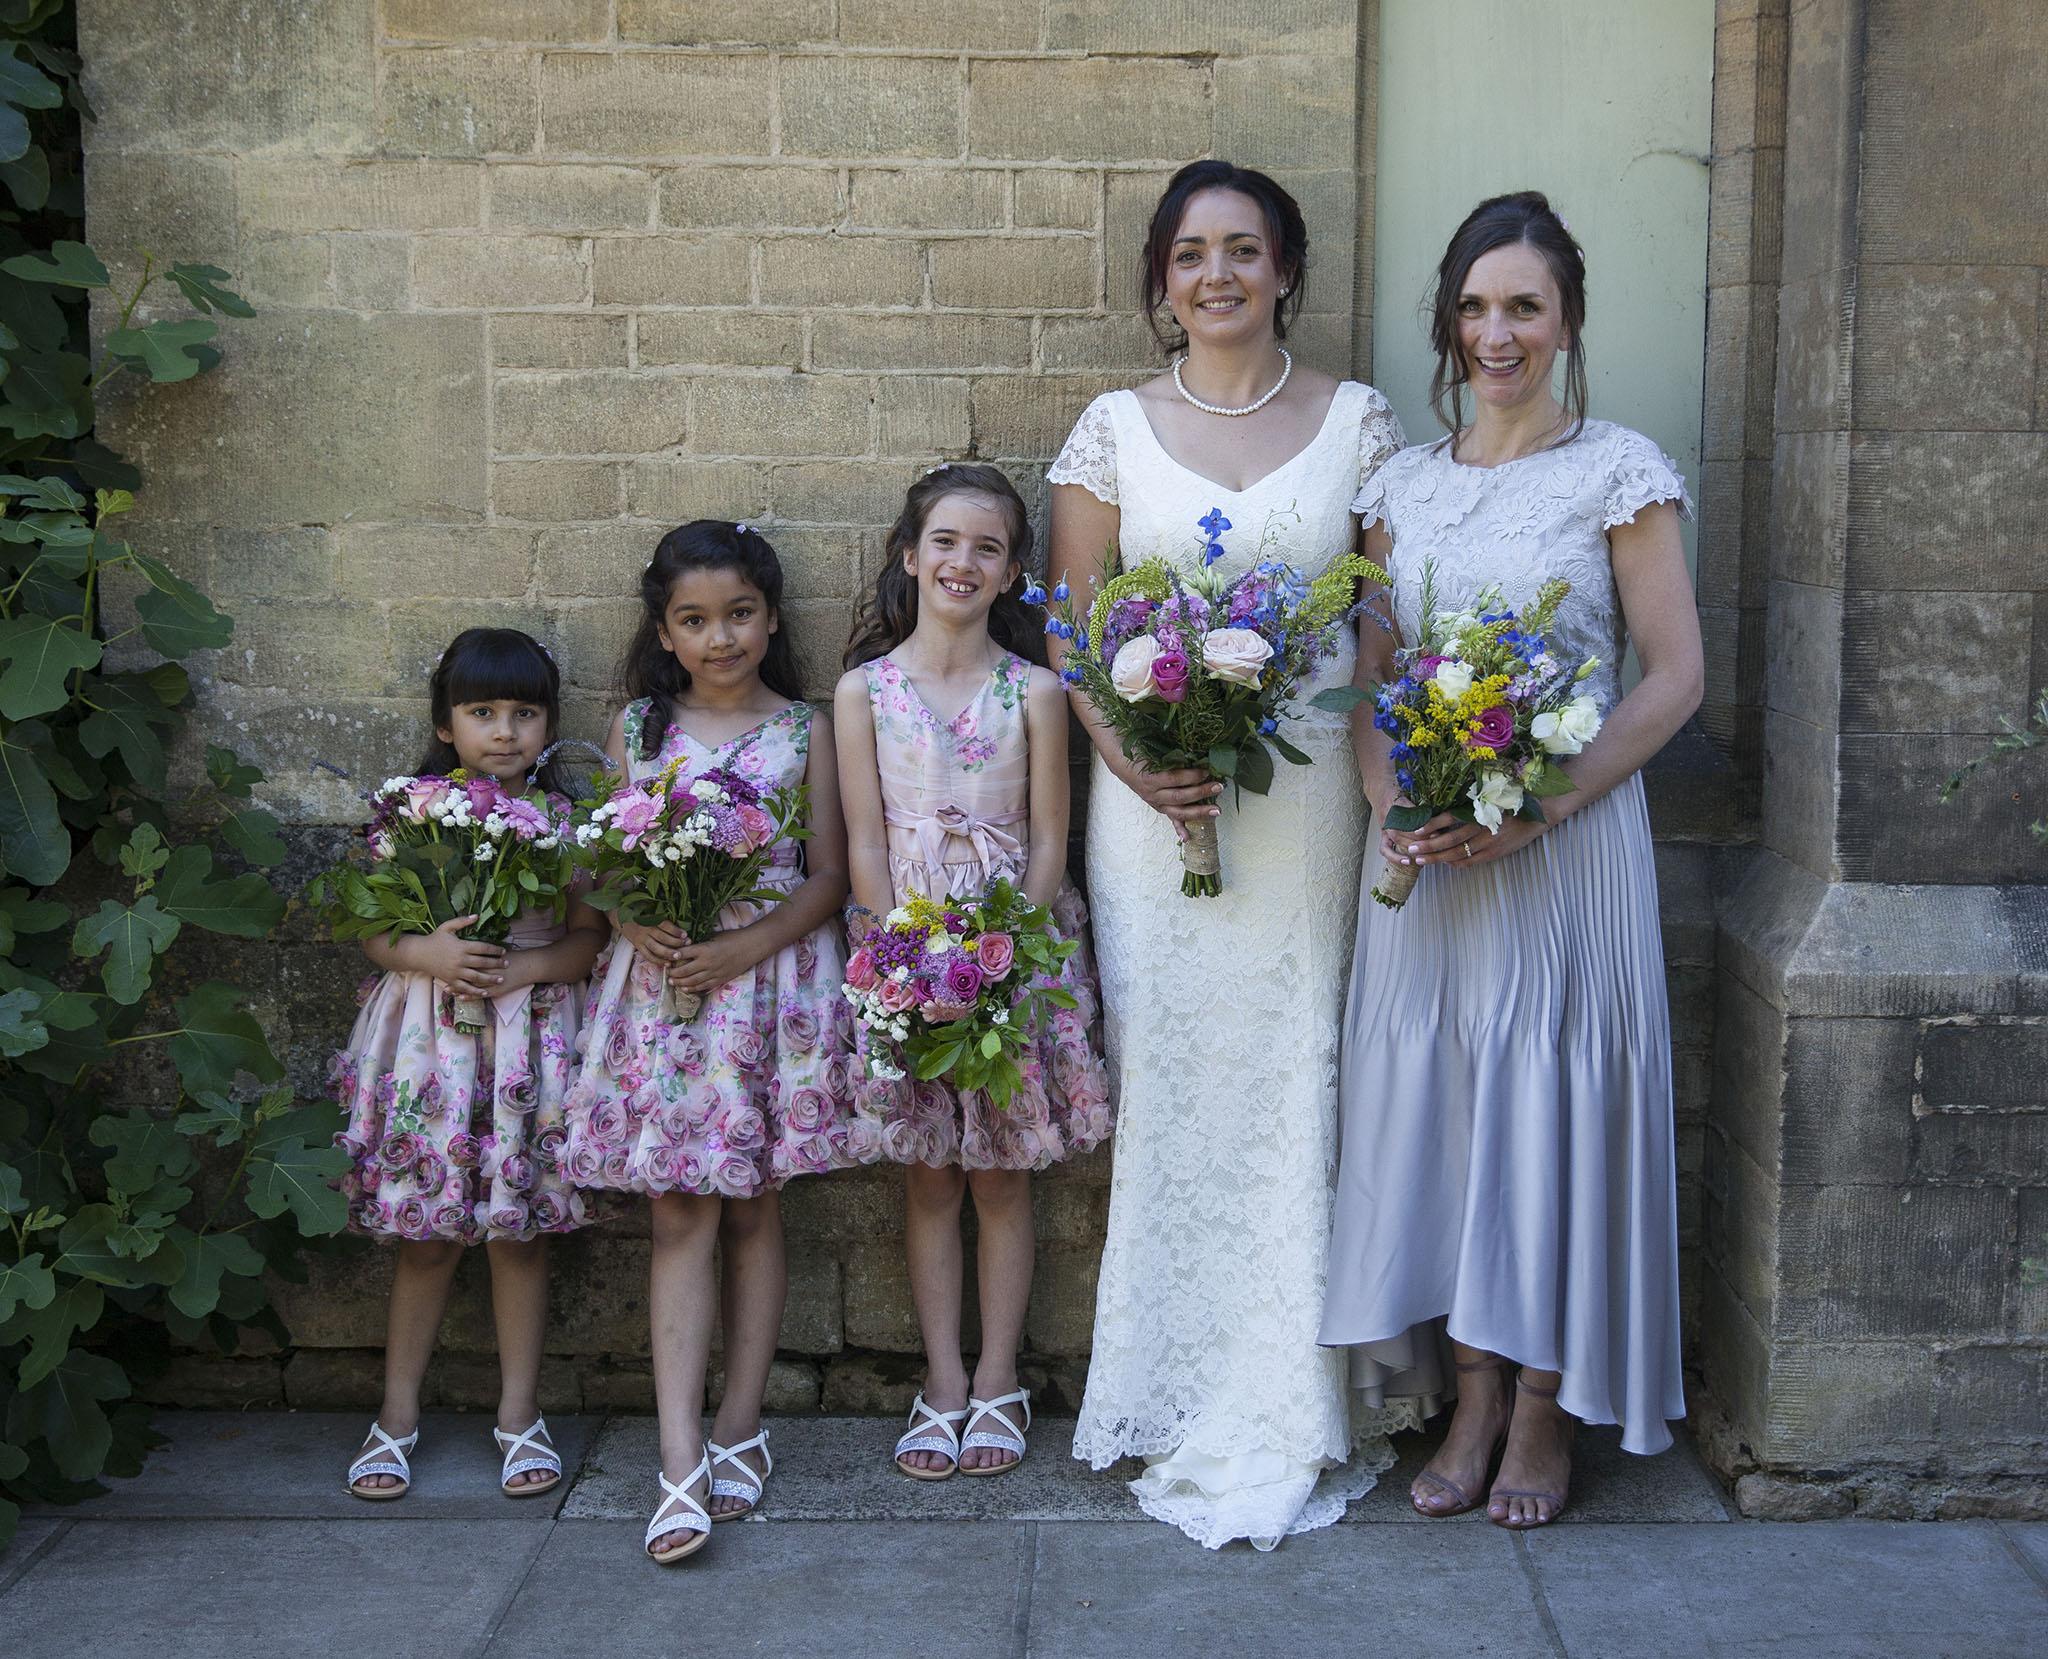 elizabethgphotography_kingslangley_hertfordshire_fineart_wedding_photography_lincolnshire_anna_simon_25.jpg